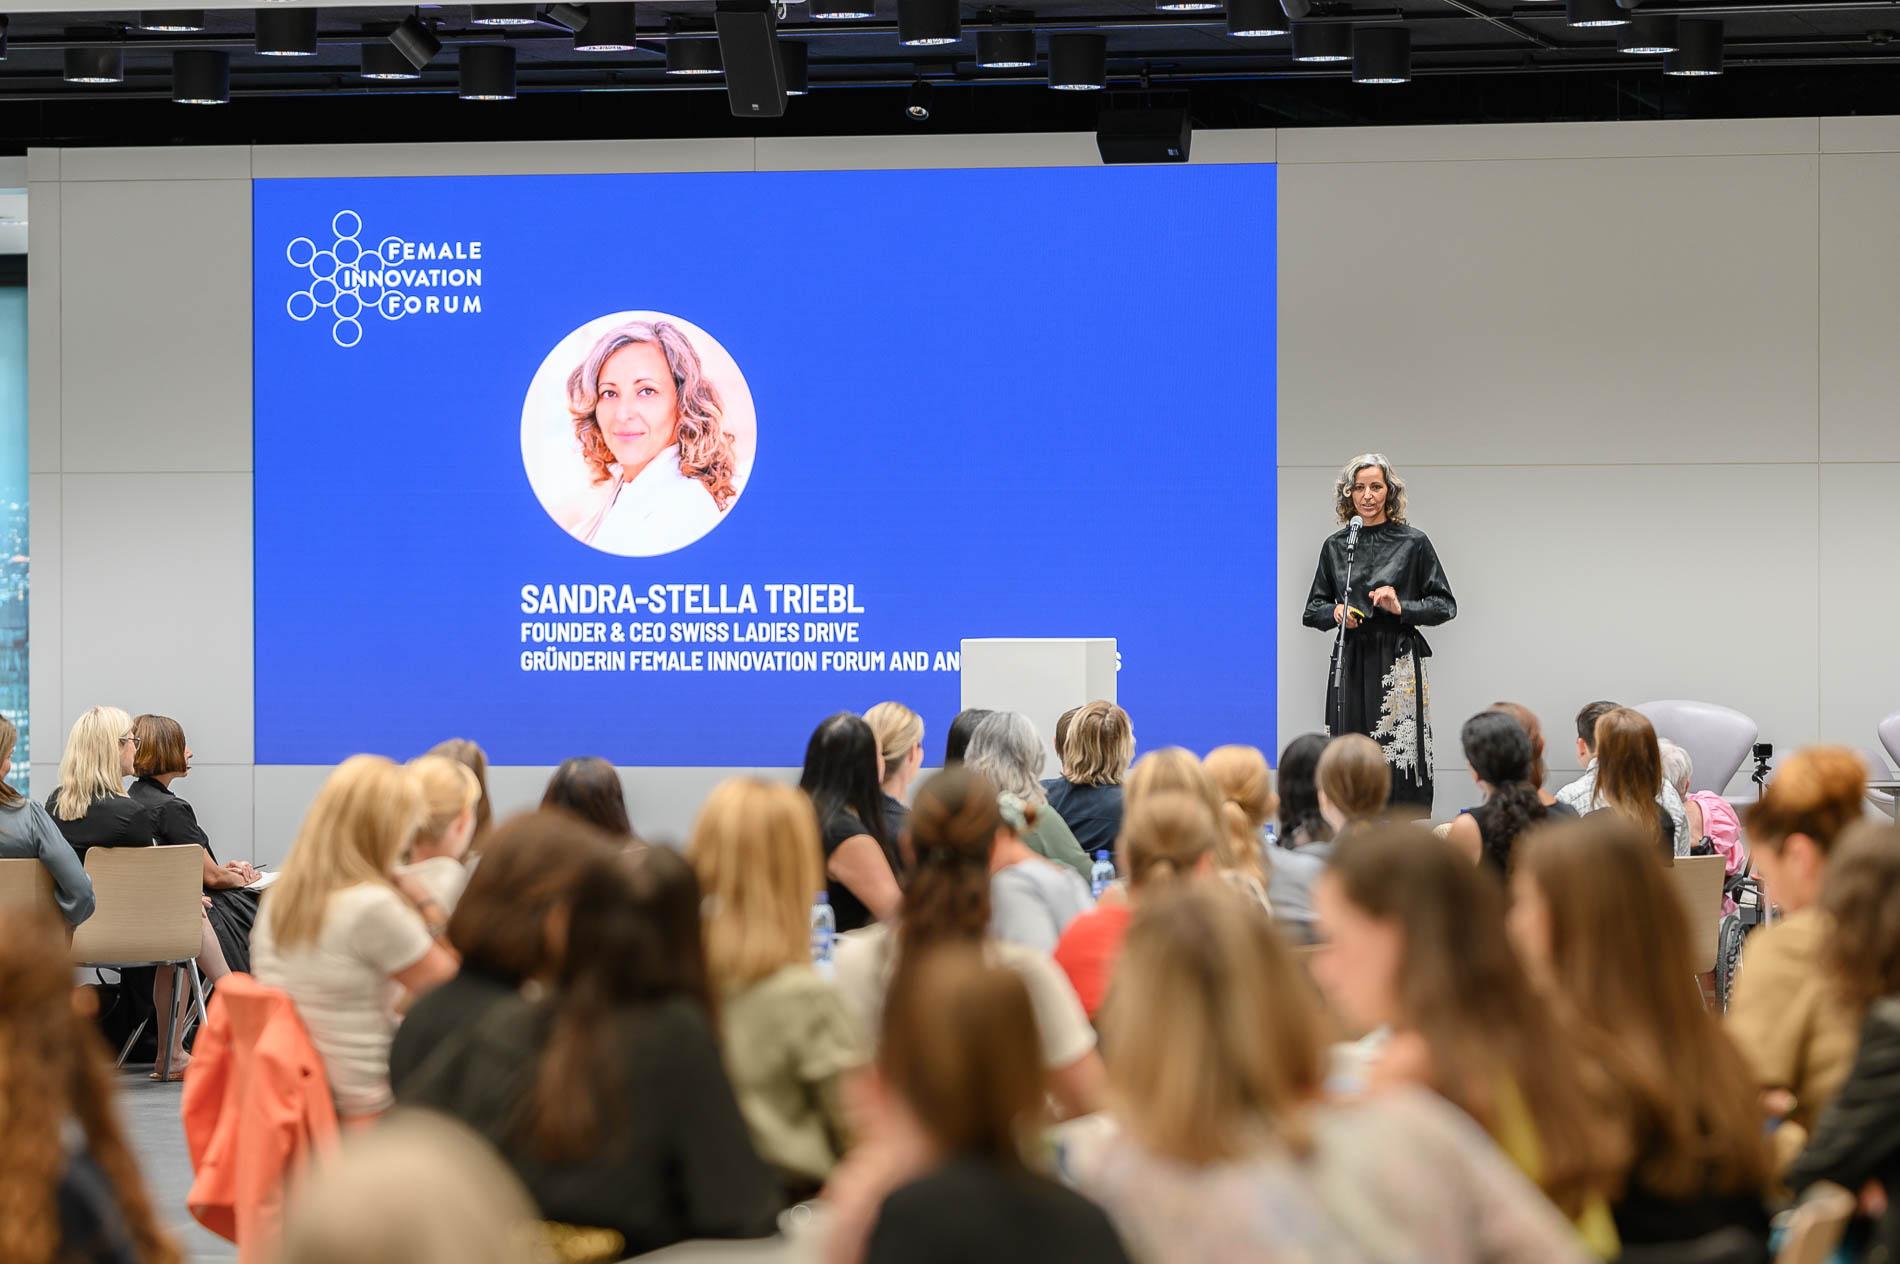 Female Innovation Forum 2020